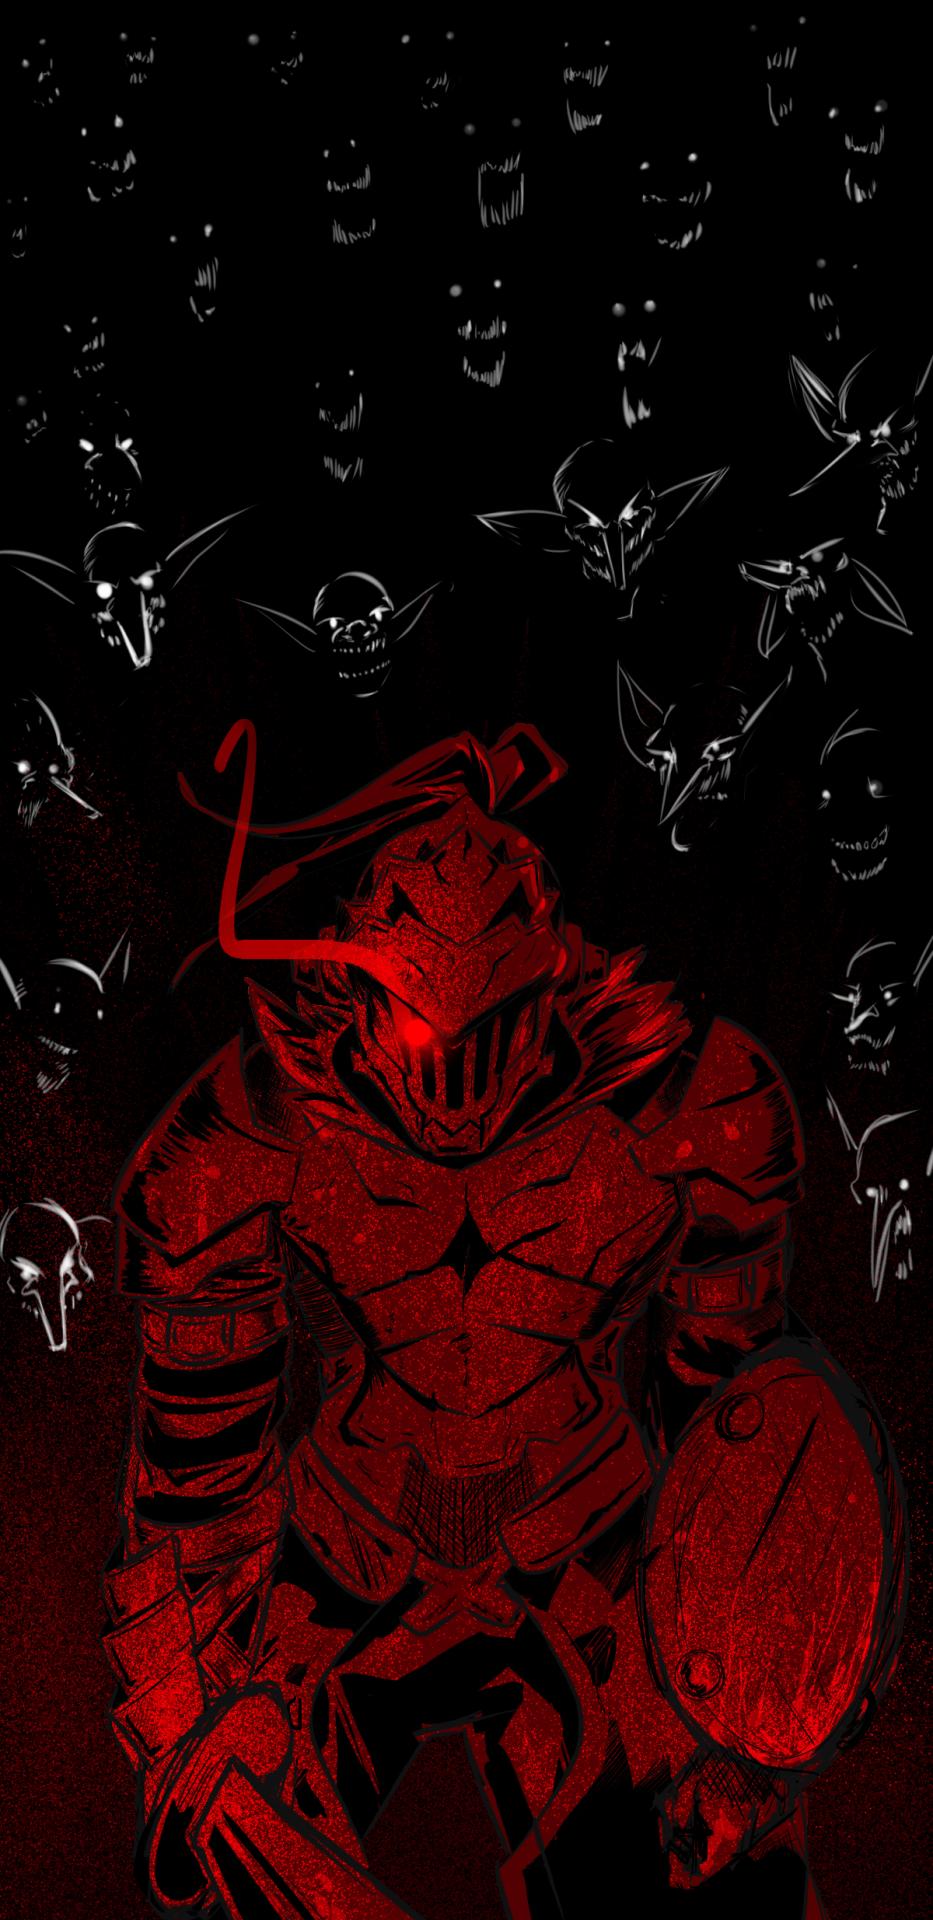 Pin de kingkasma78 em Goblin Slayer Animes wallpapers